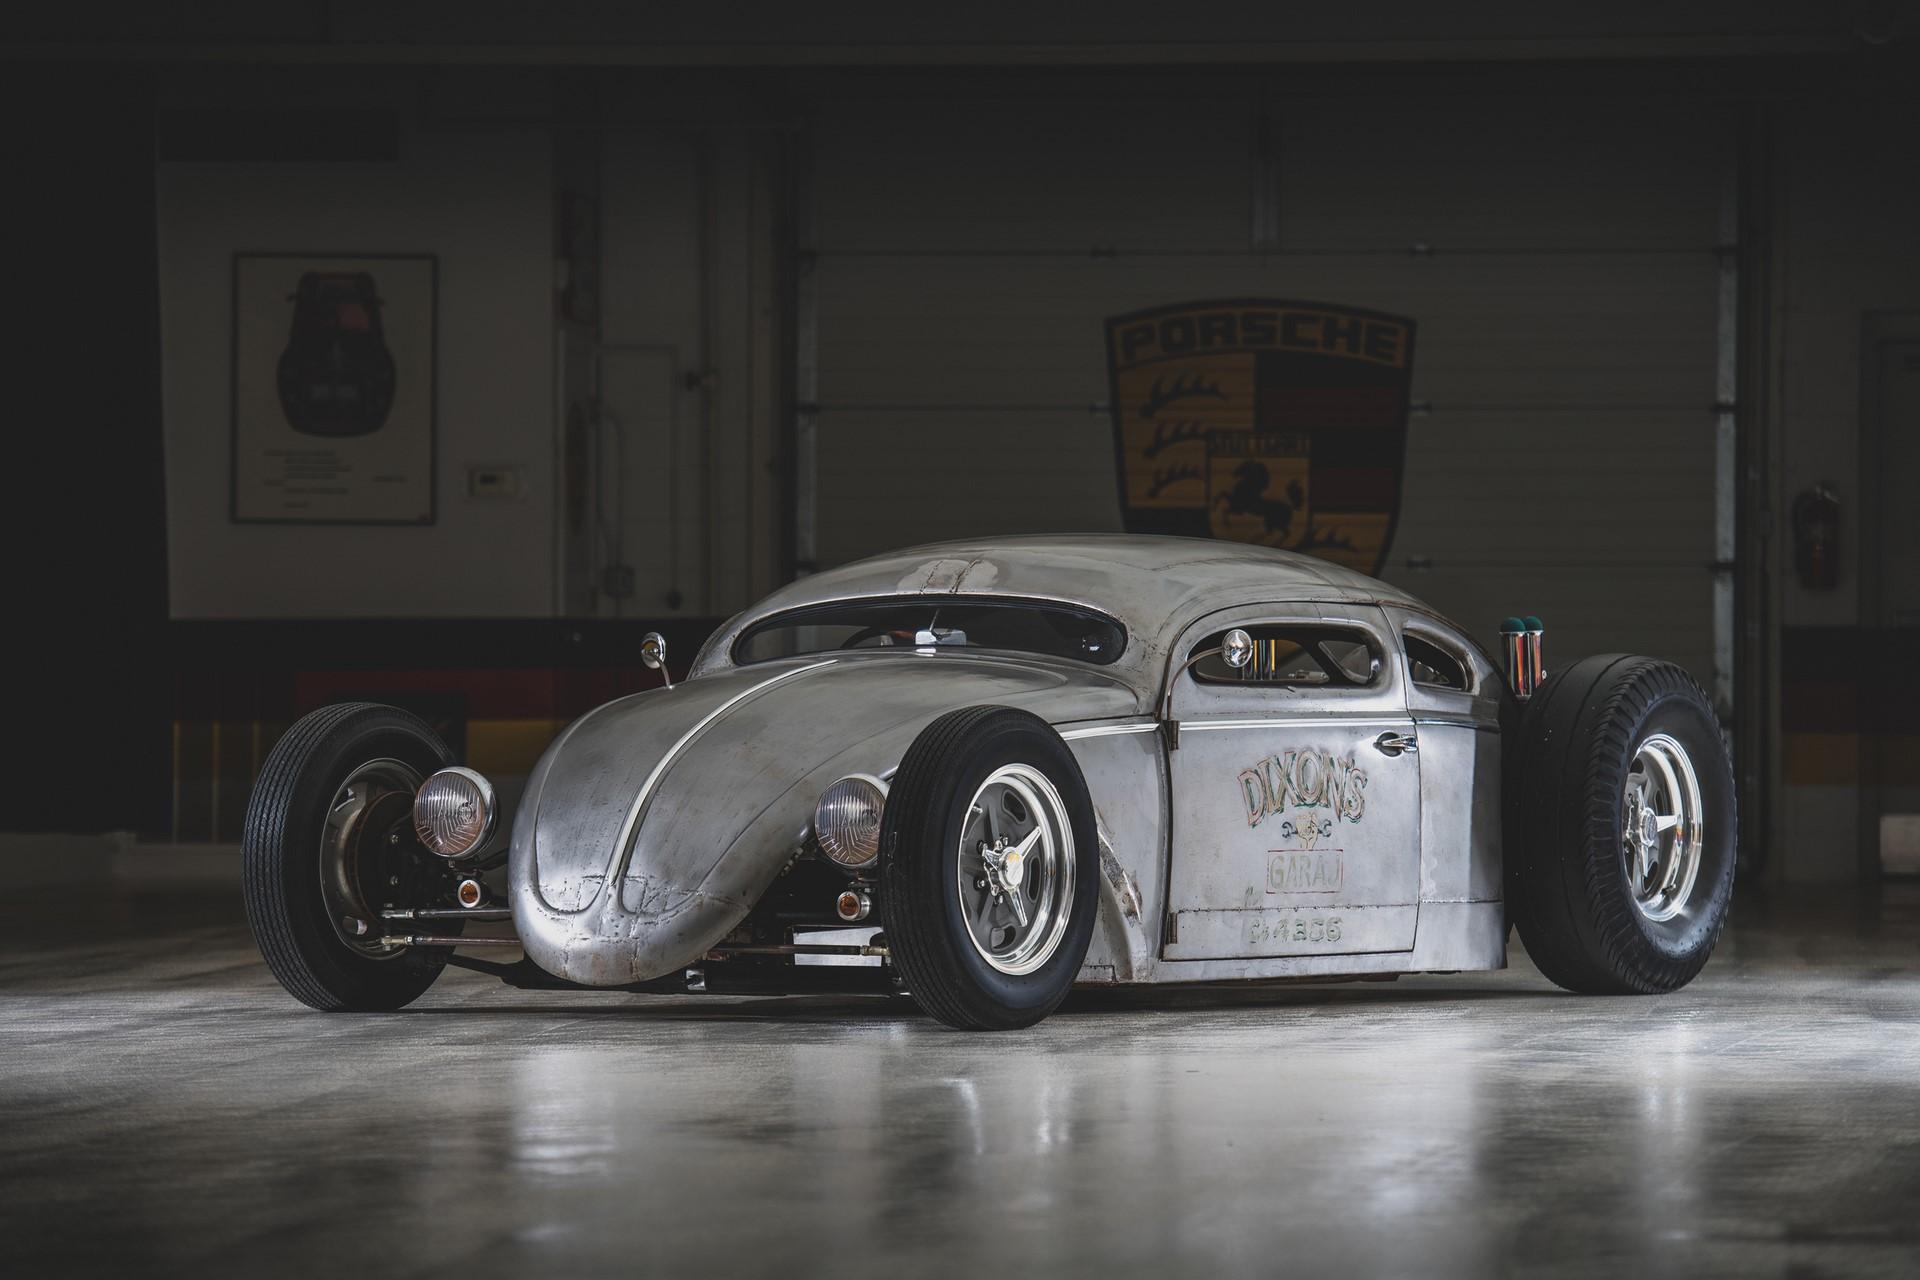 rm-taj-ma-garaj-auction-10